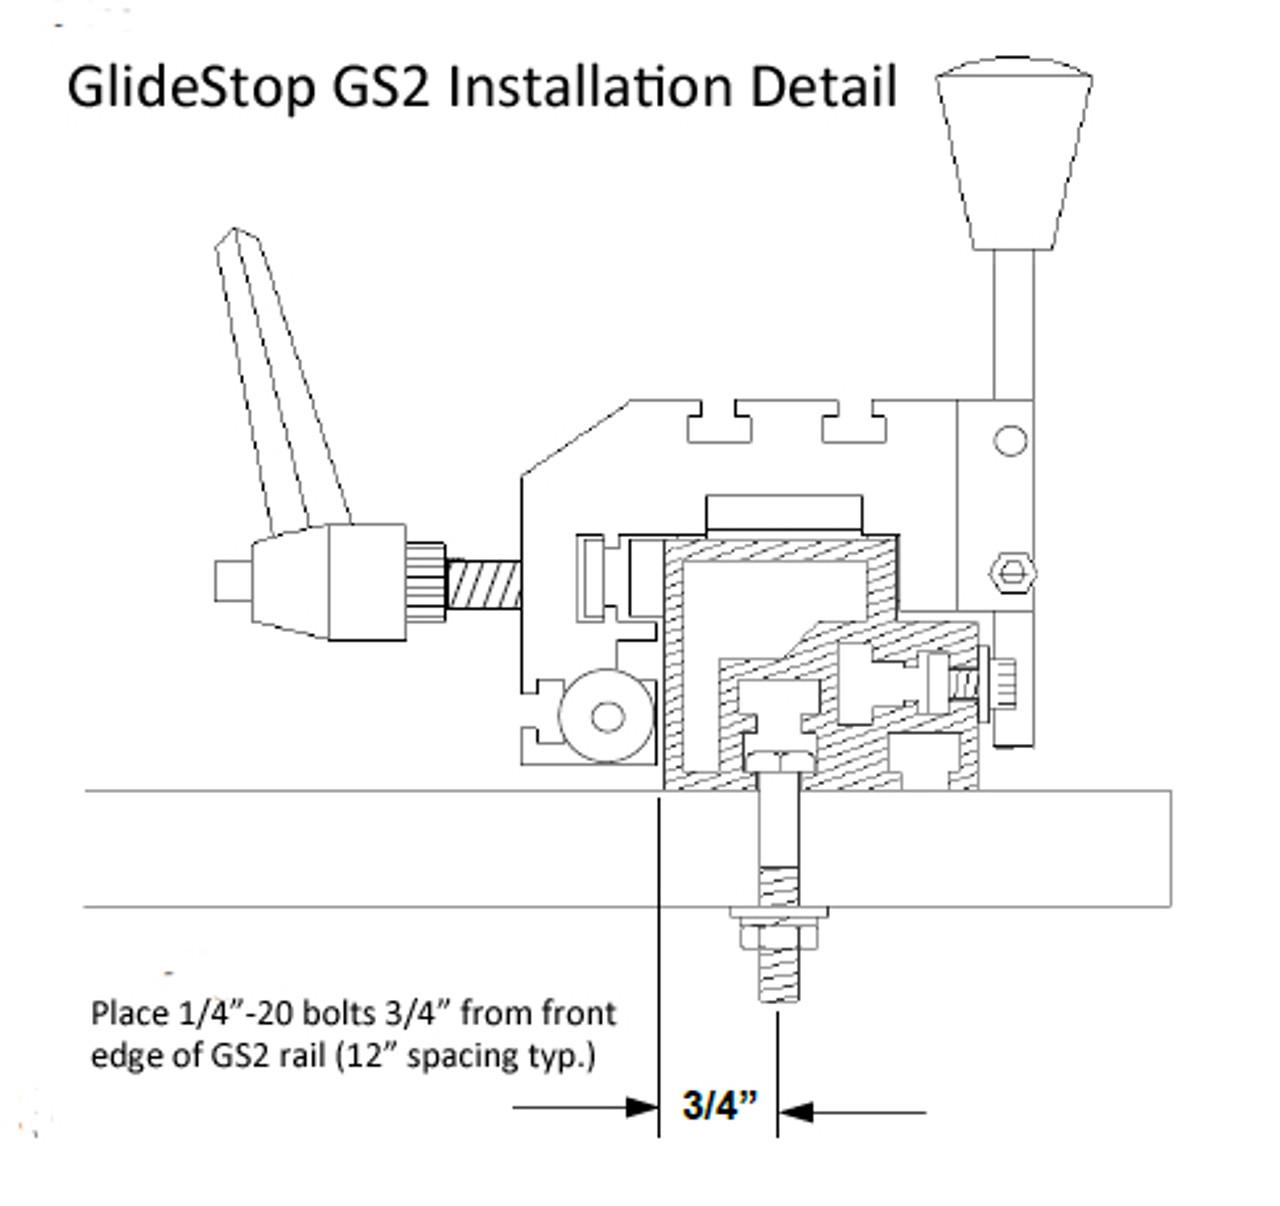 GlideStop GS2 rail installation detail, by Hoffmann-USA.jpg